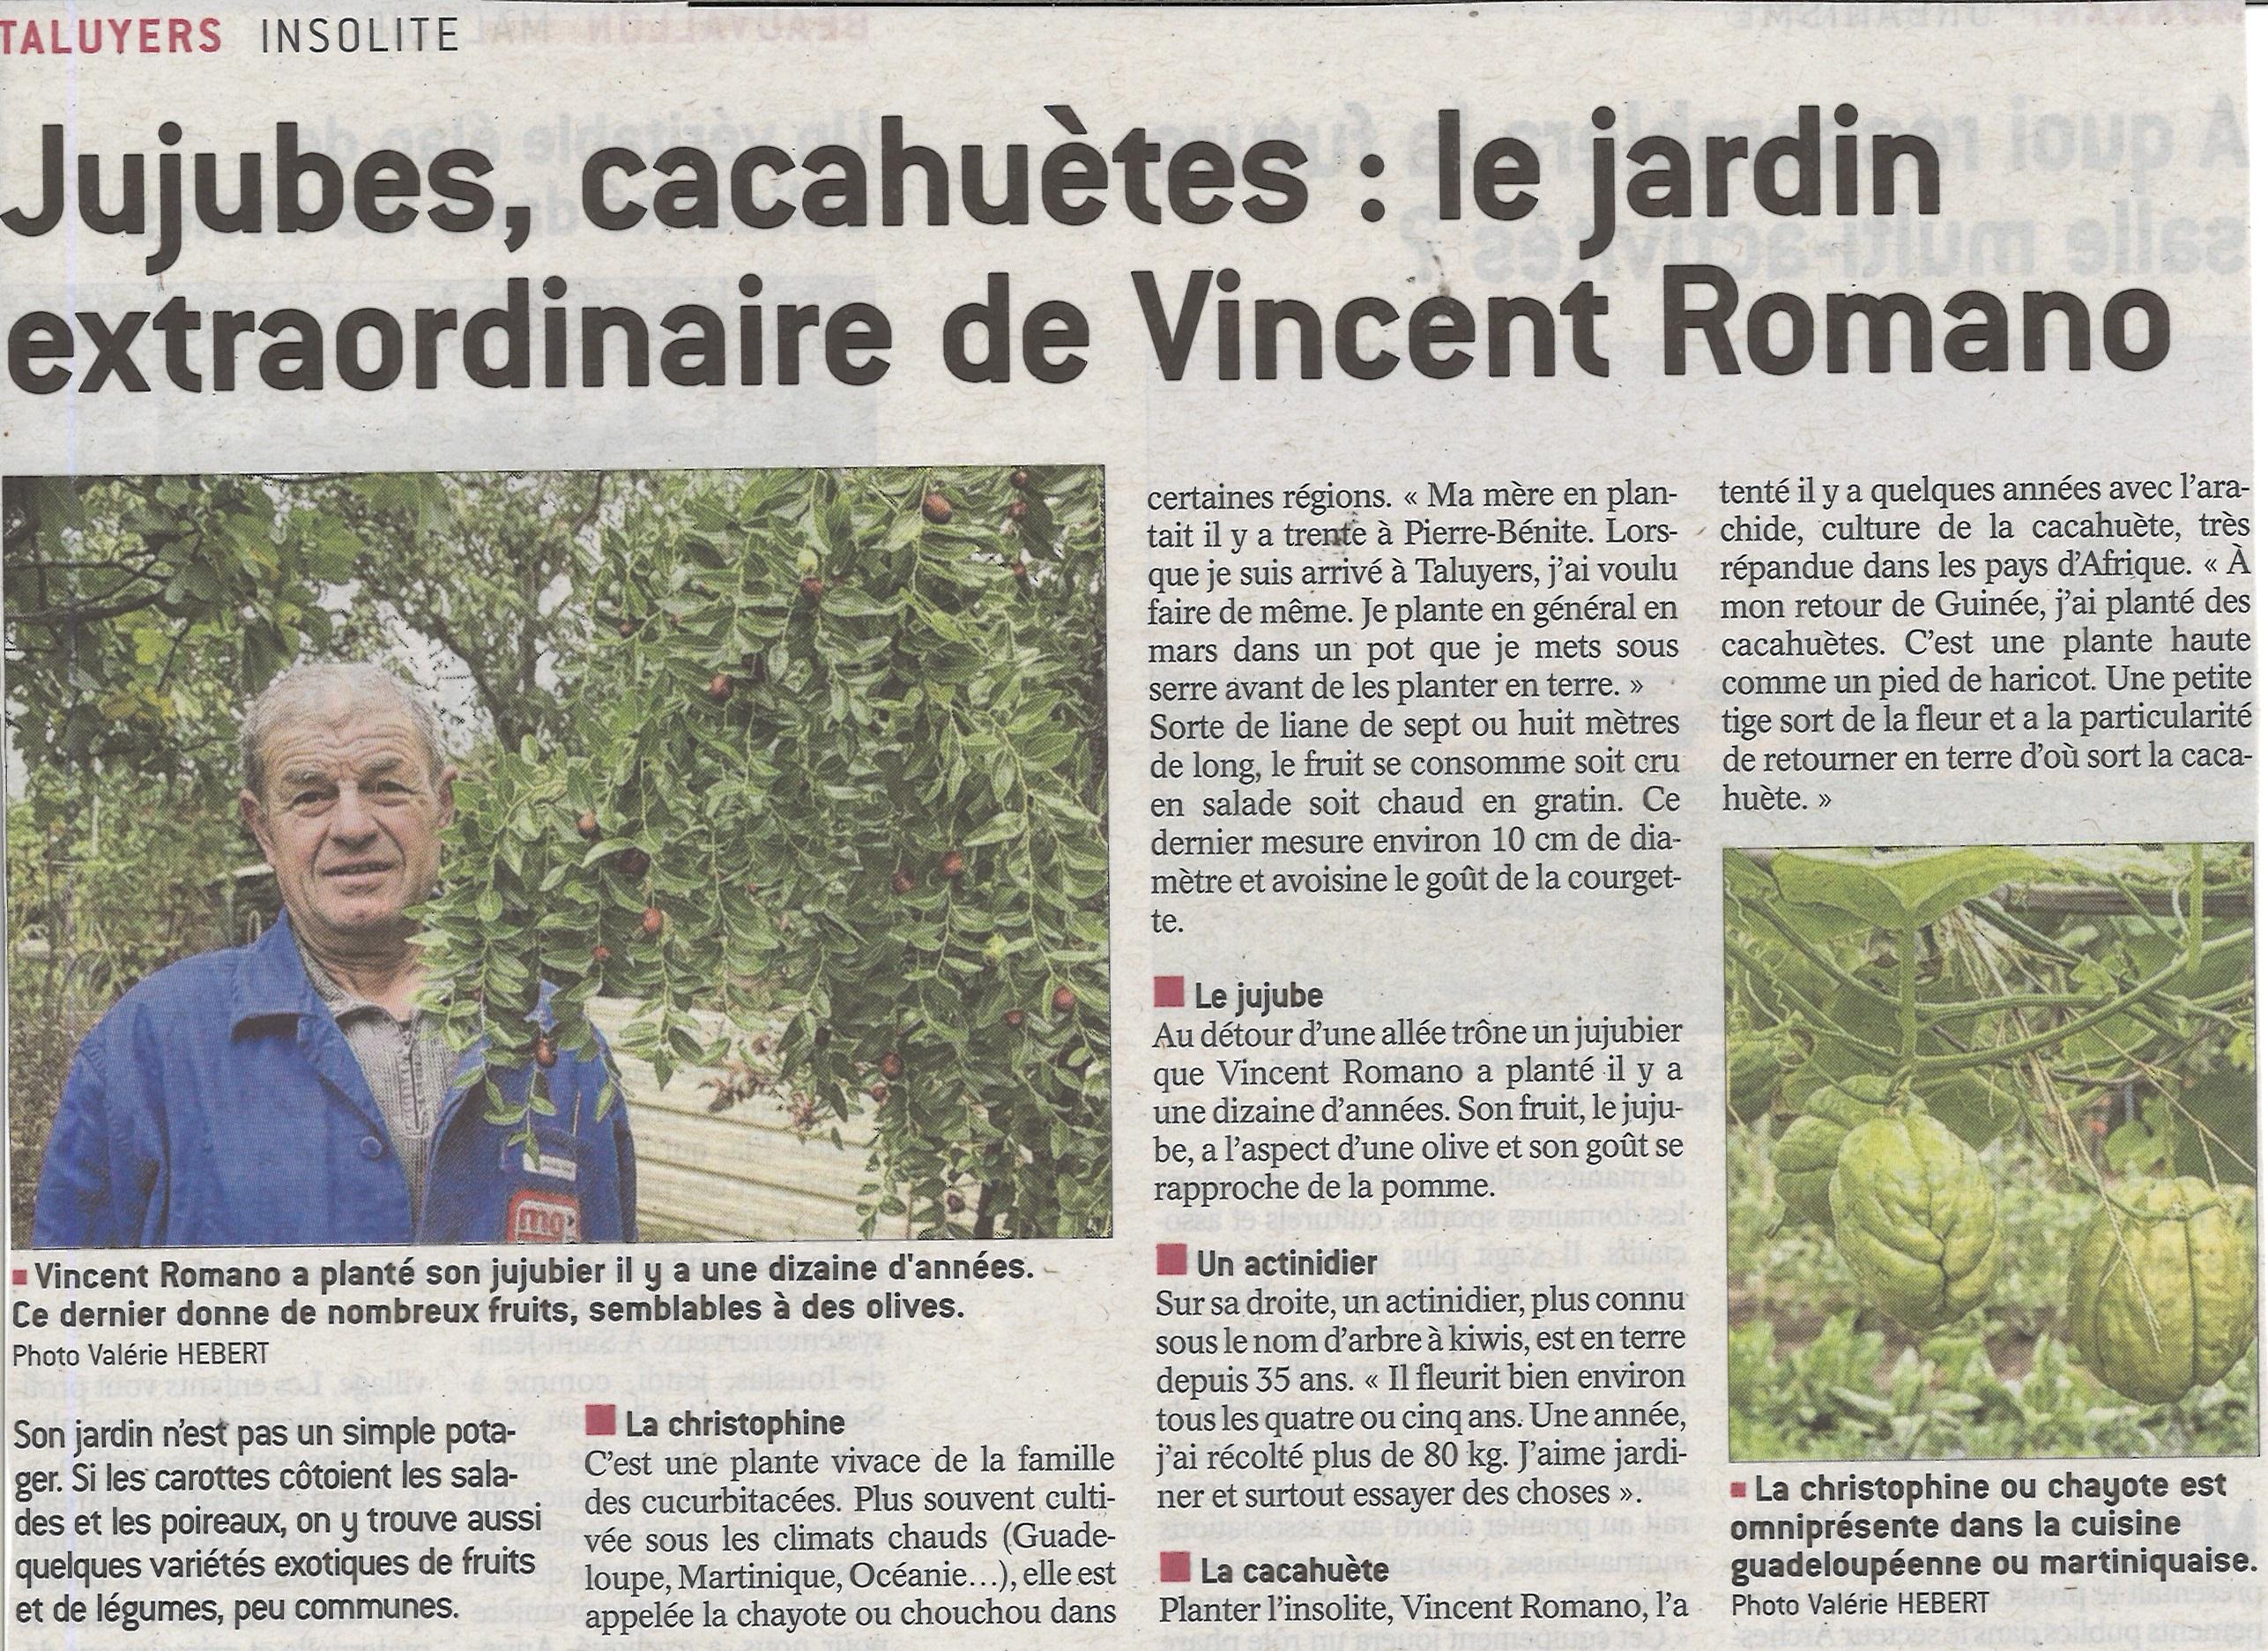 Le jardin extraordinaire de Vincent Romano